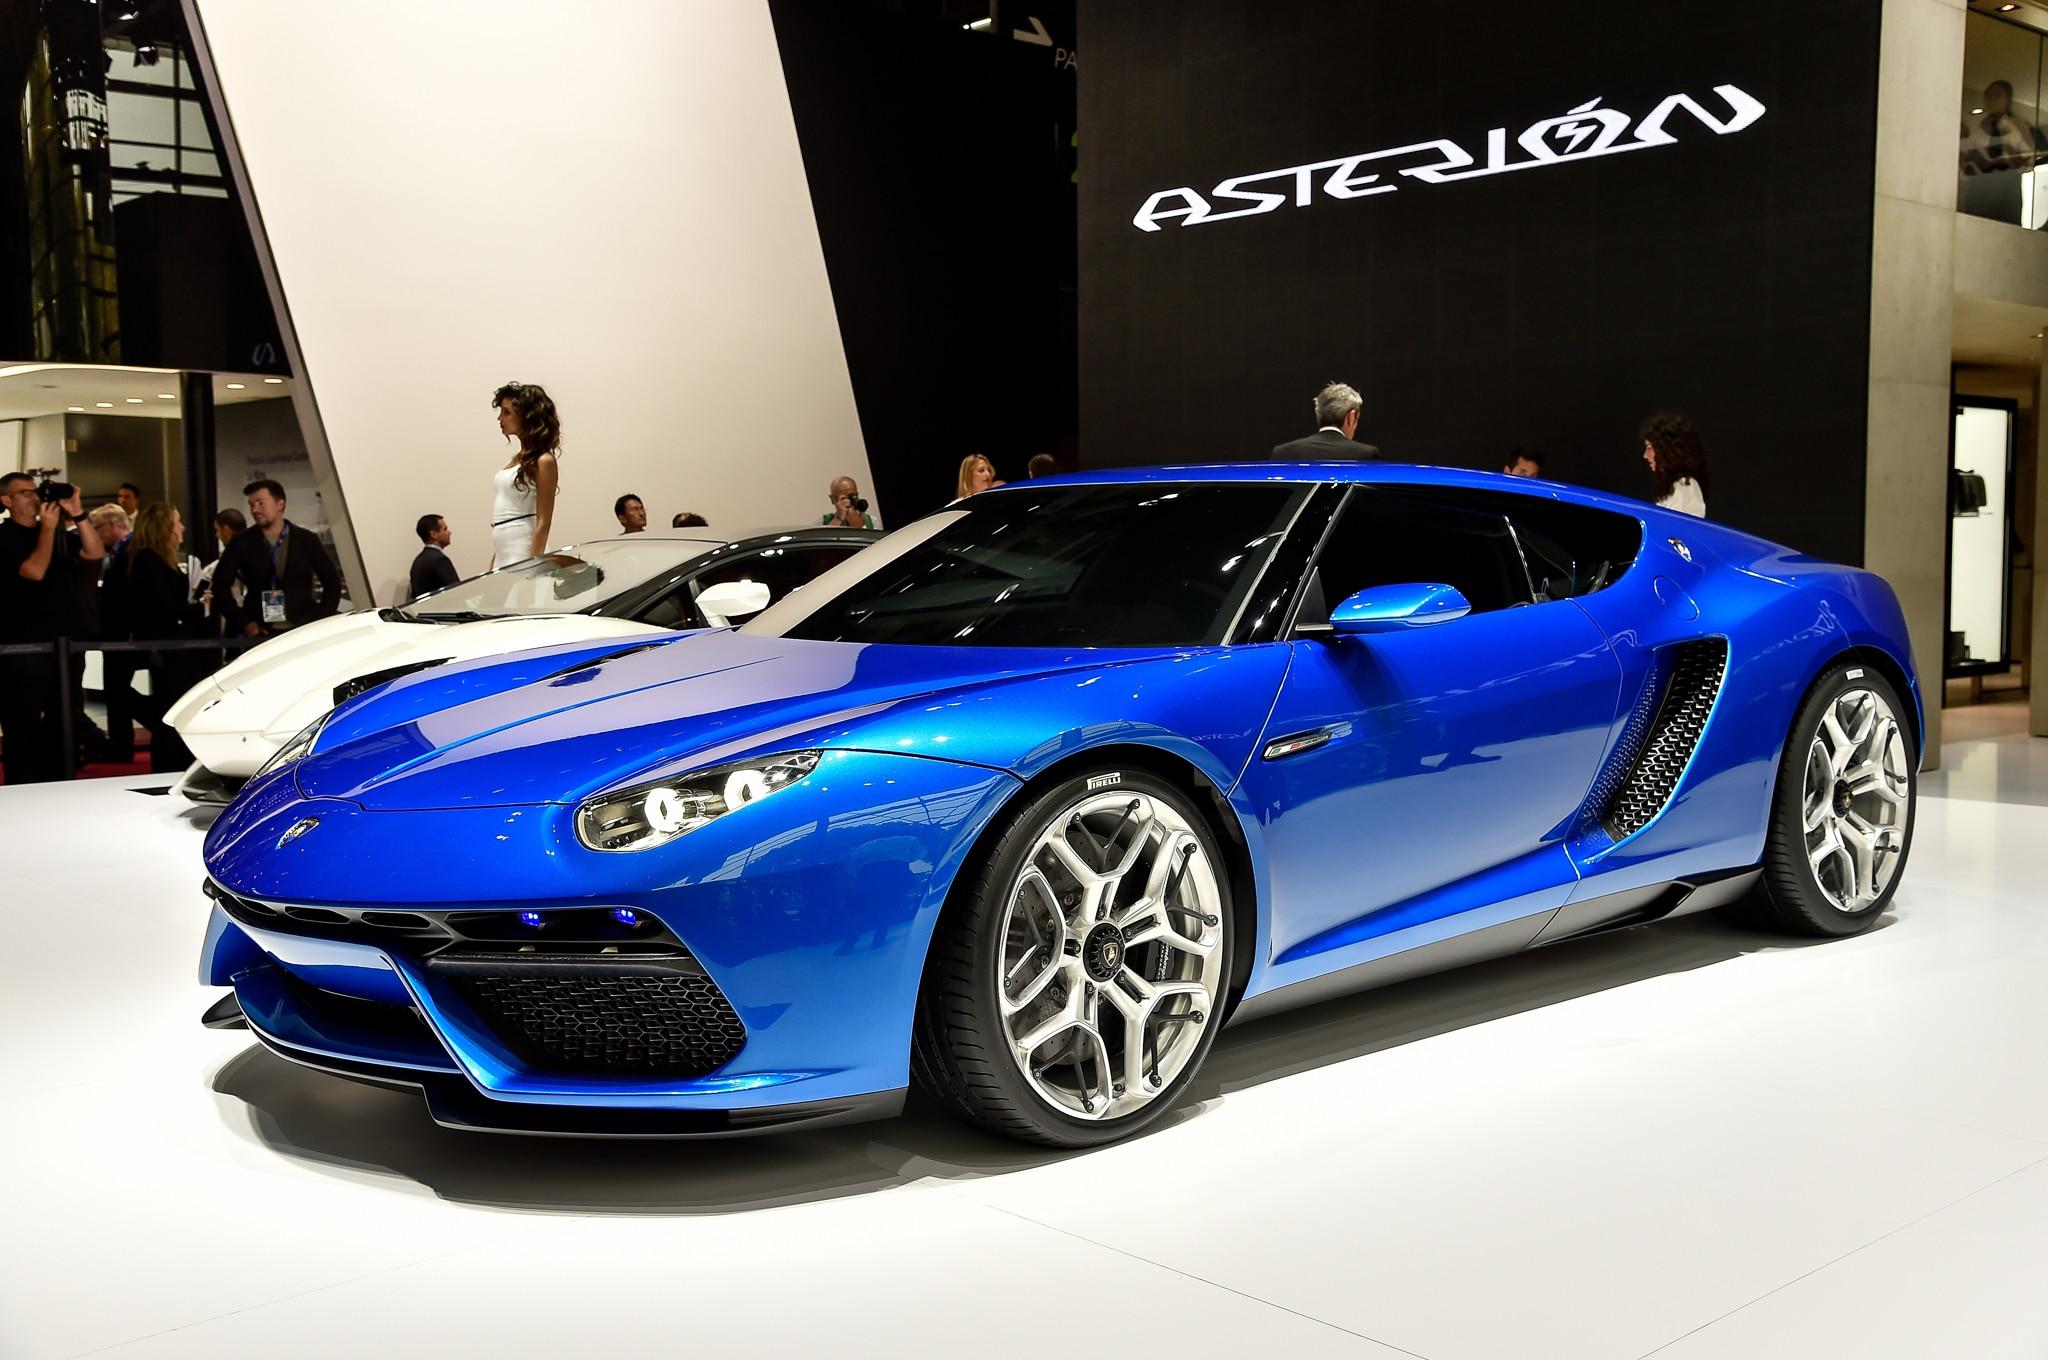 Lamborghini Asterion Concept Front Three Quarter 02